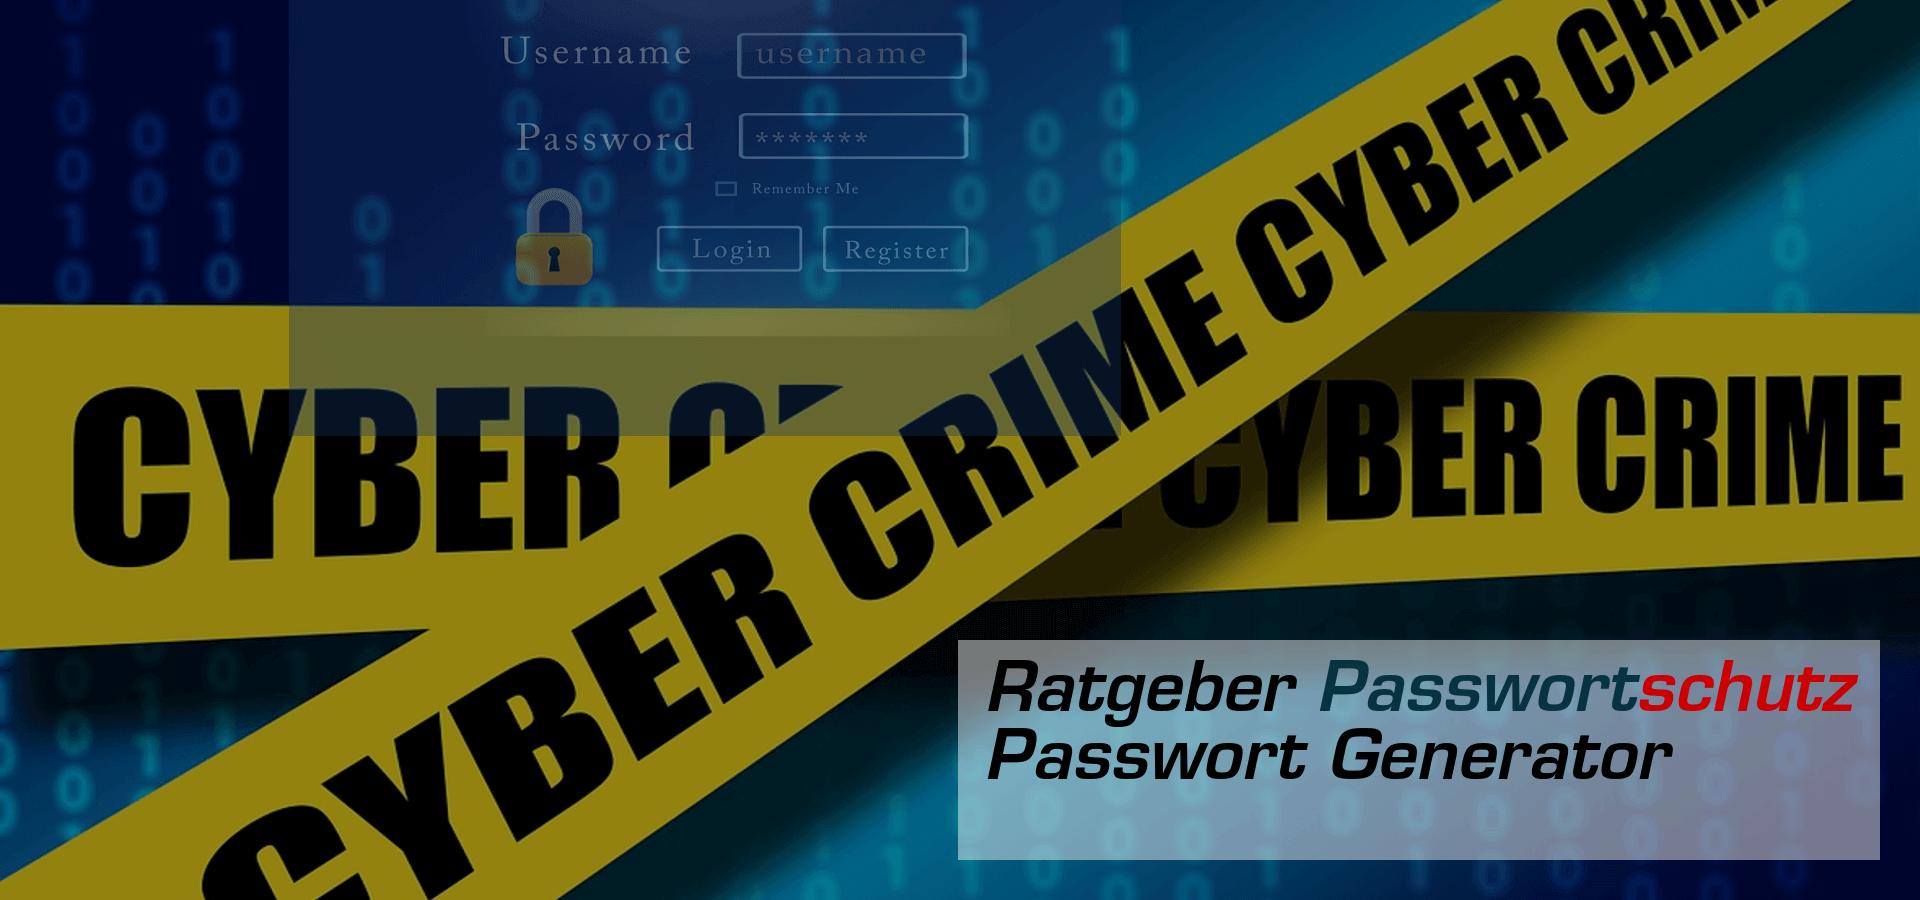 Passwort Generator - Sicheres-Netz - sicheres Passwort generieren